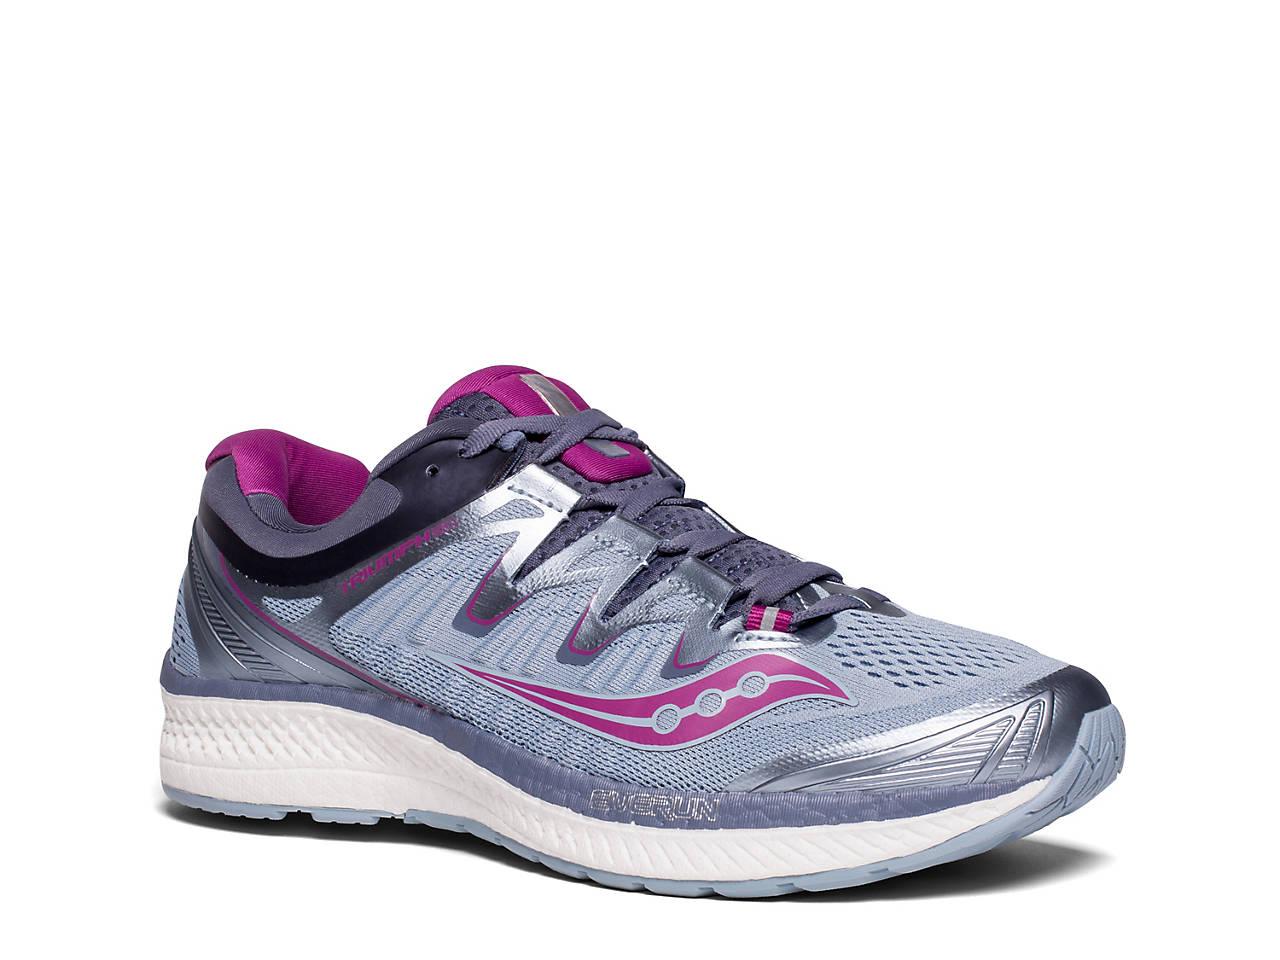 efb280988f Triumph ISO 4 Running Shoe - Women's